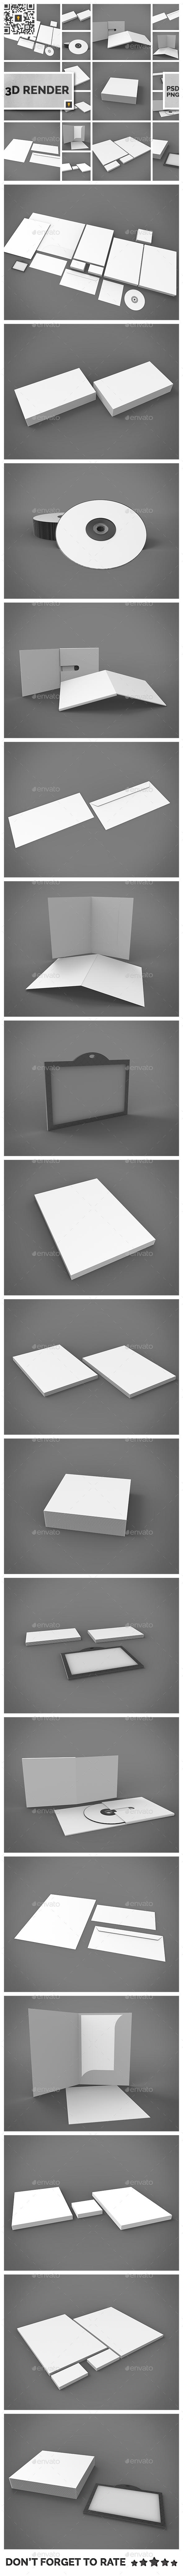 Branding Stationary 3D Render - Miscellaneous 3D Renders